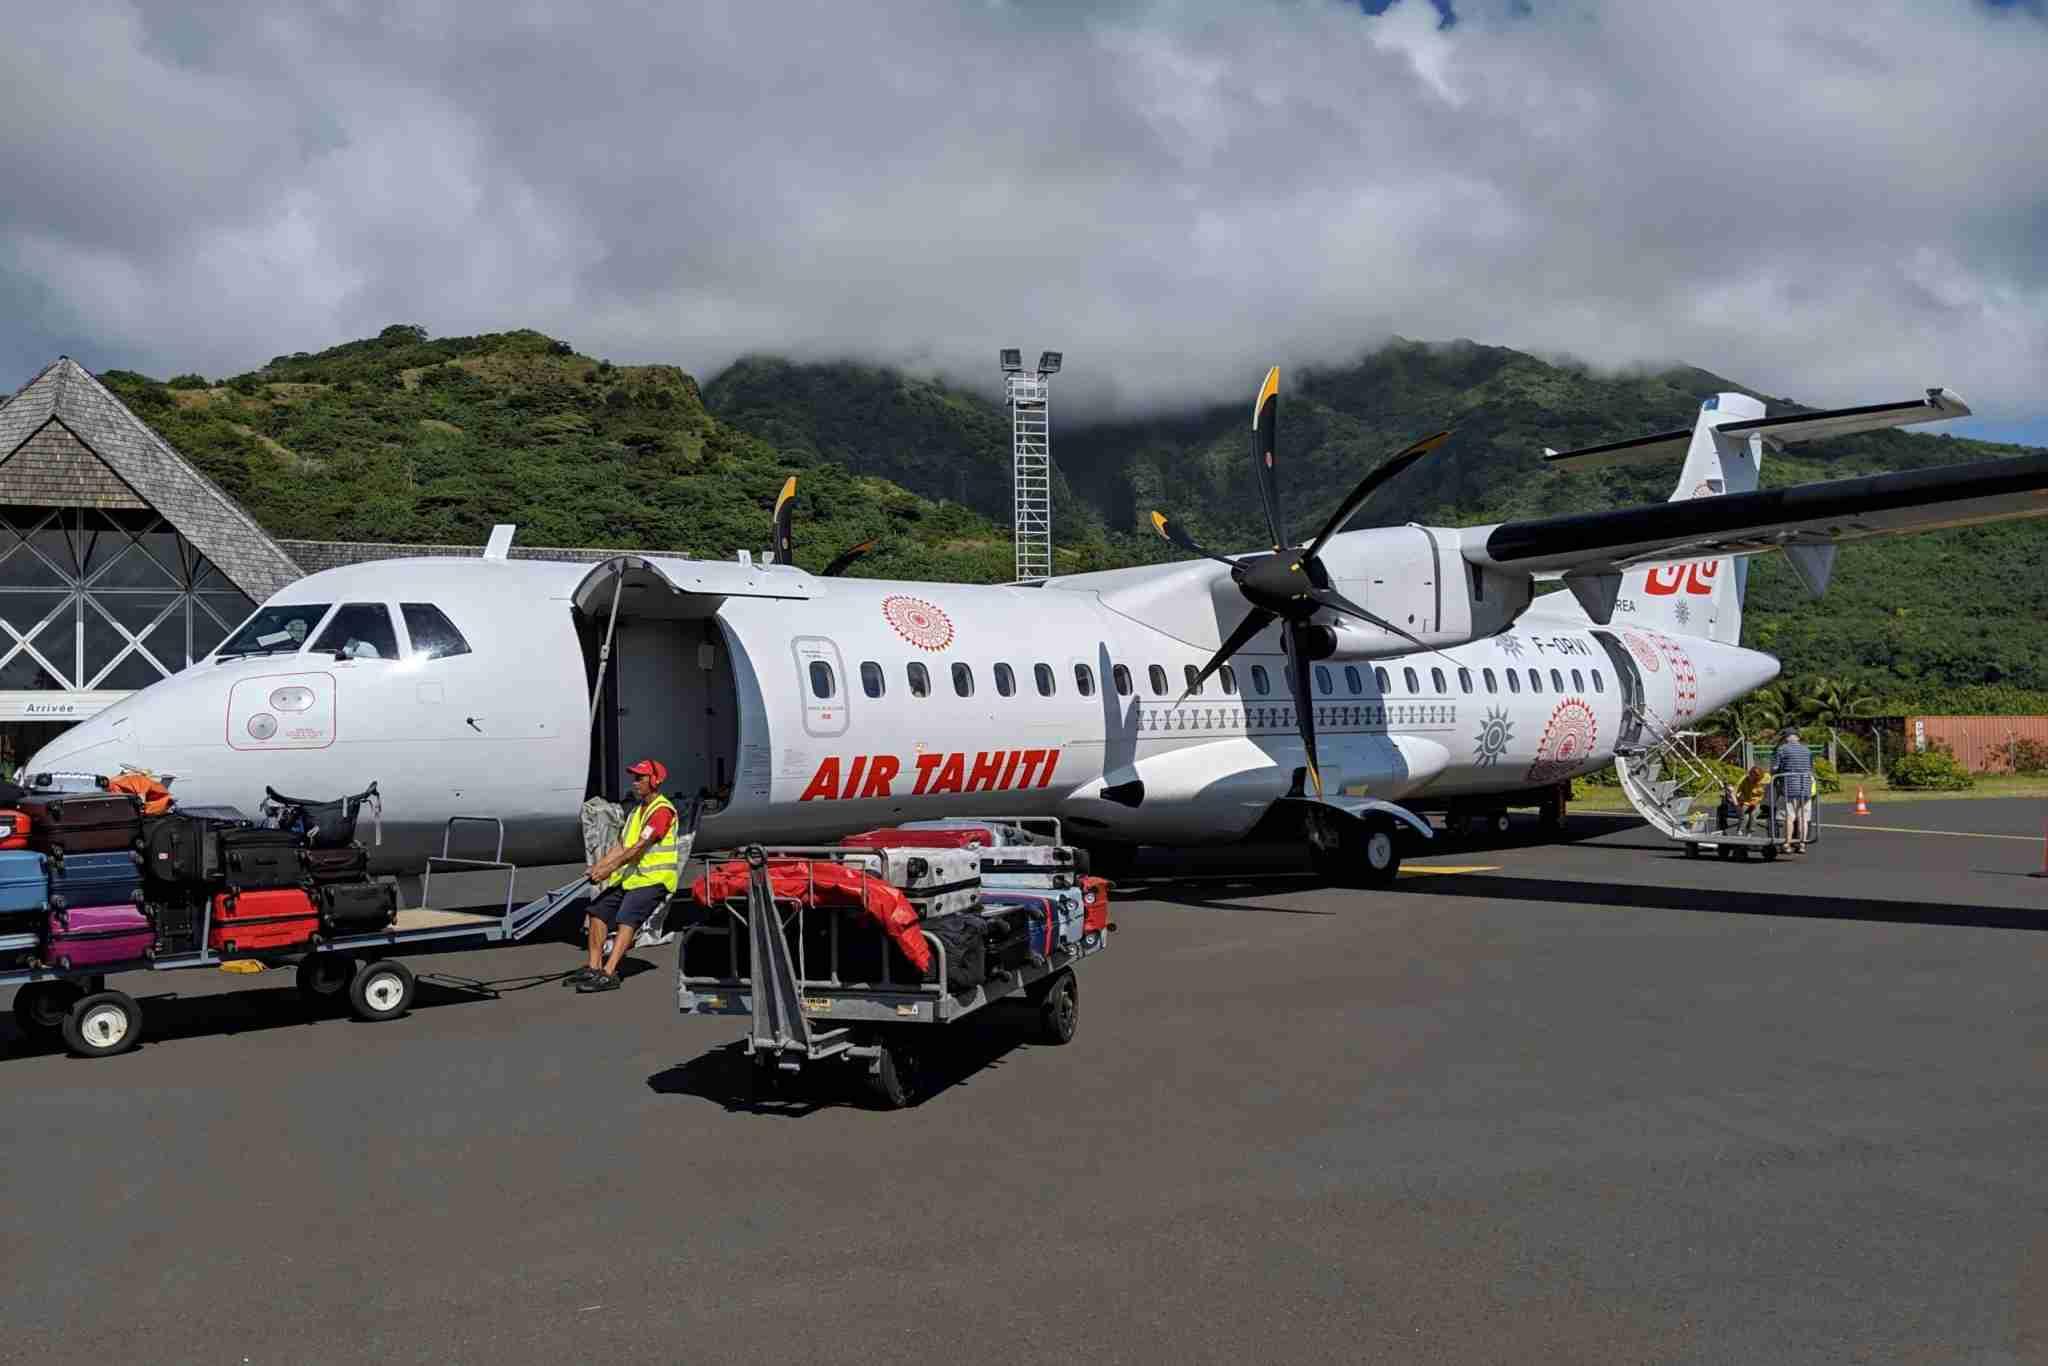 Air Tahiti plane in Moorea, French Polynesia